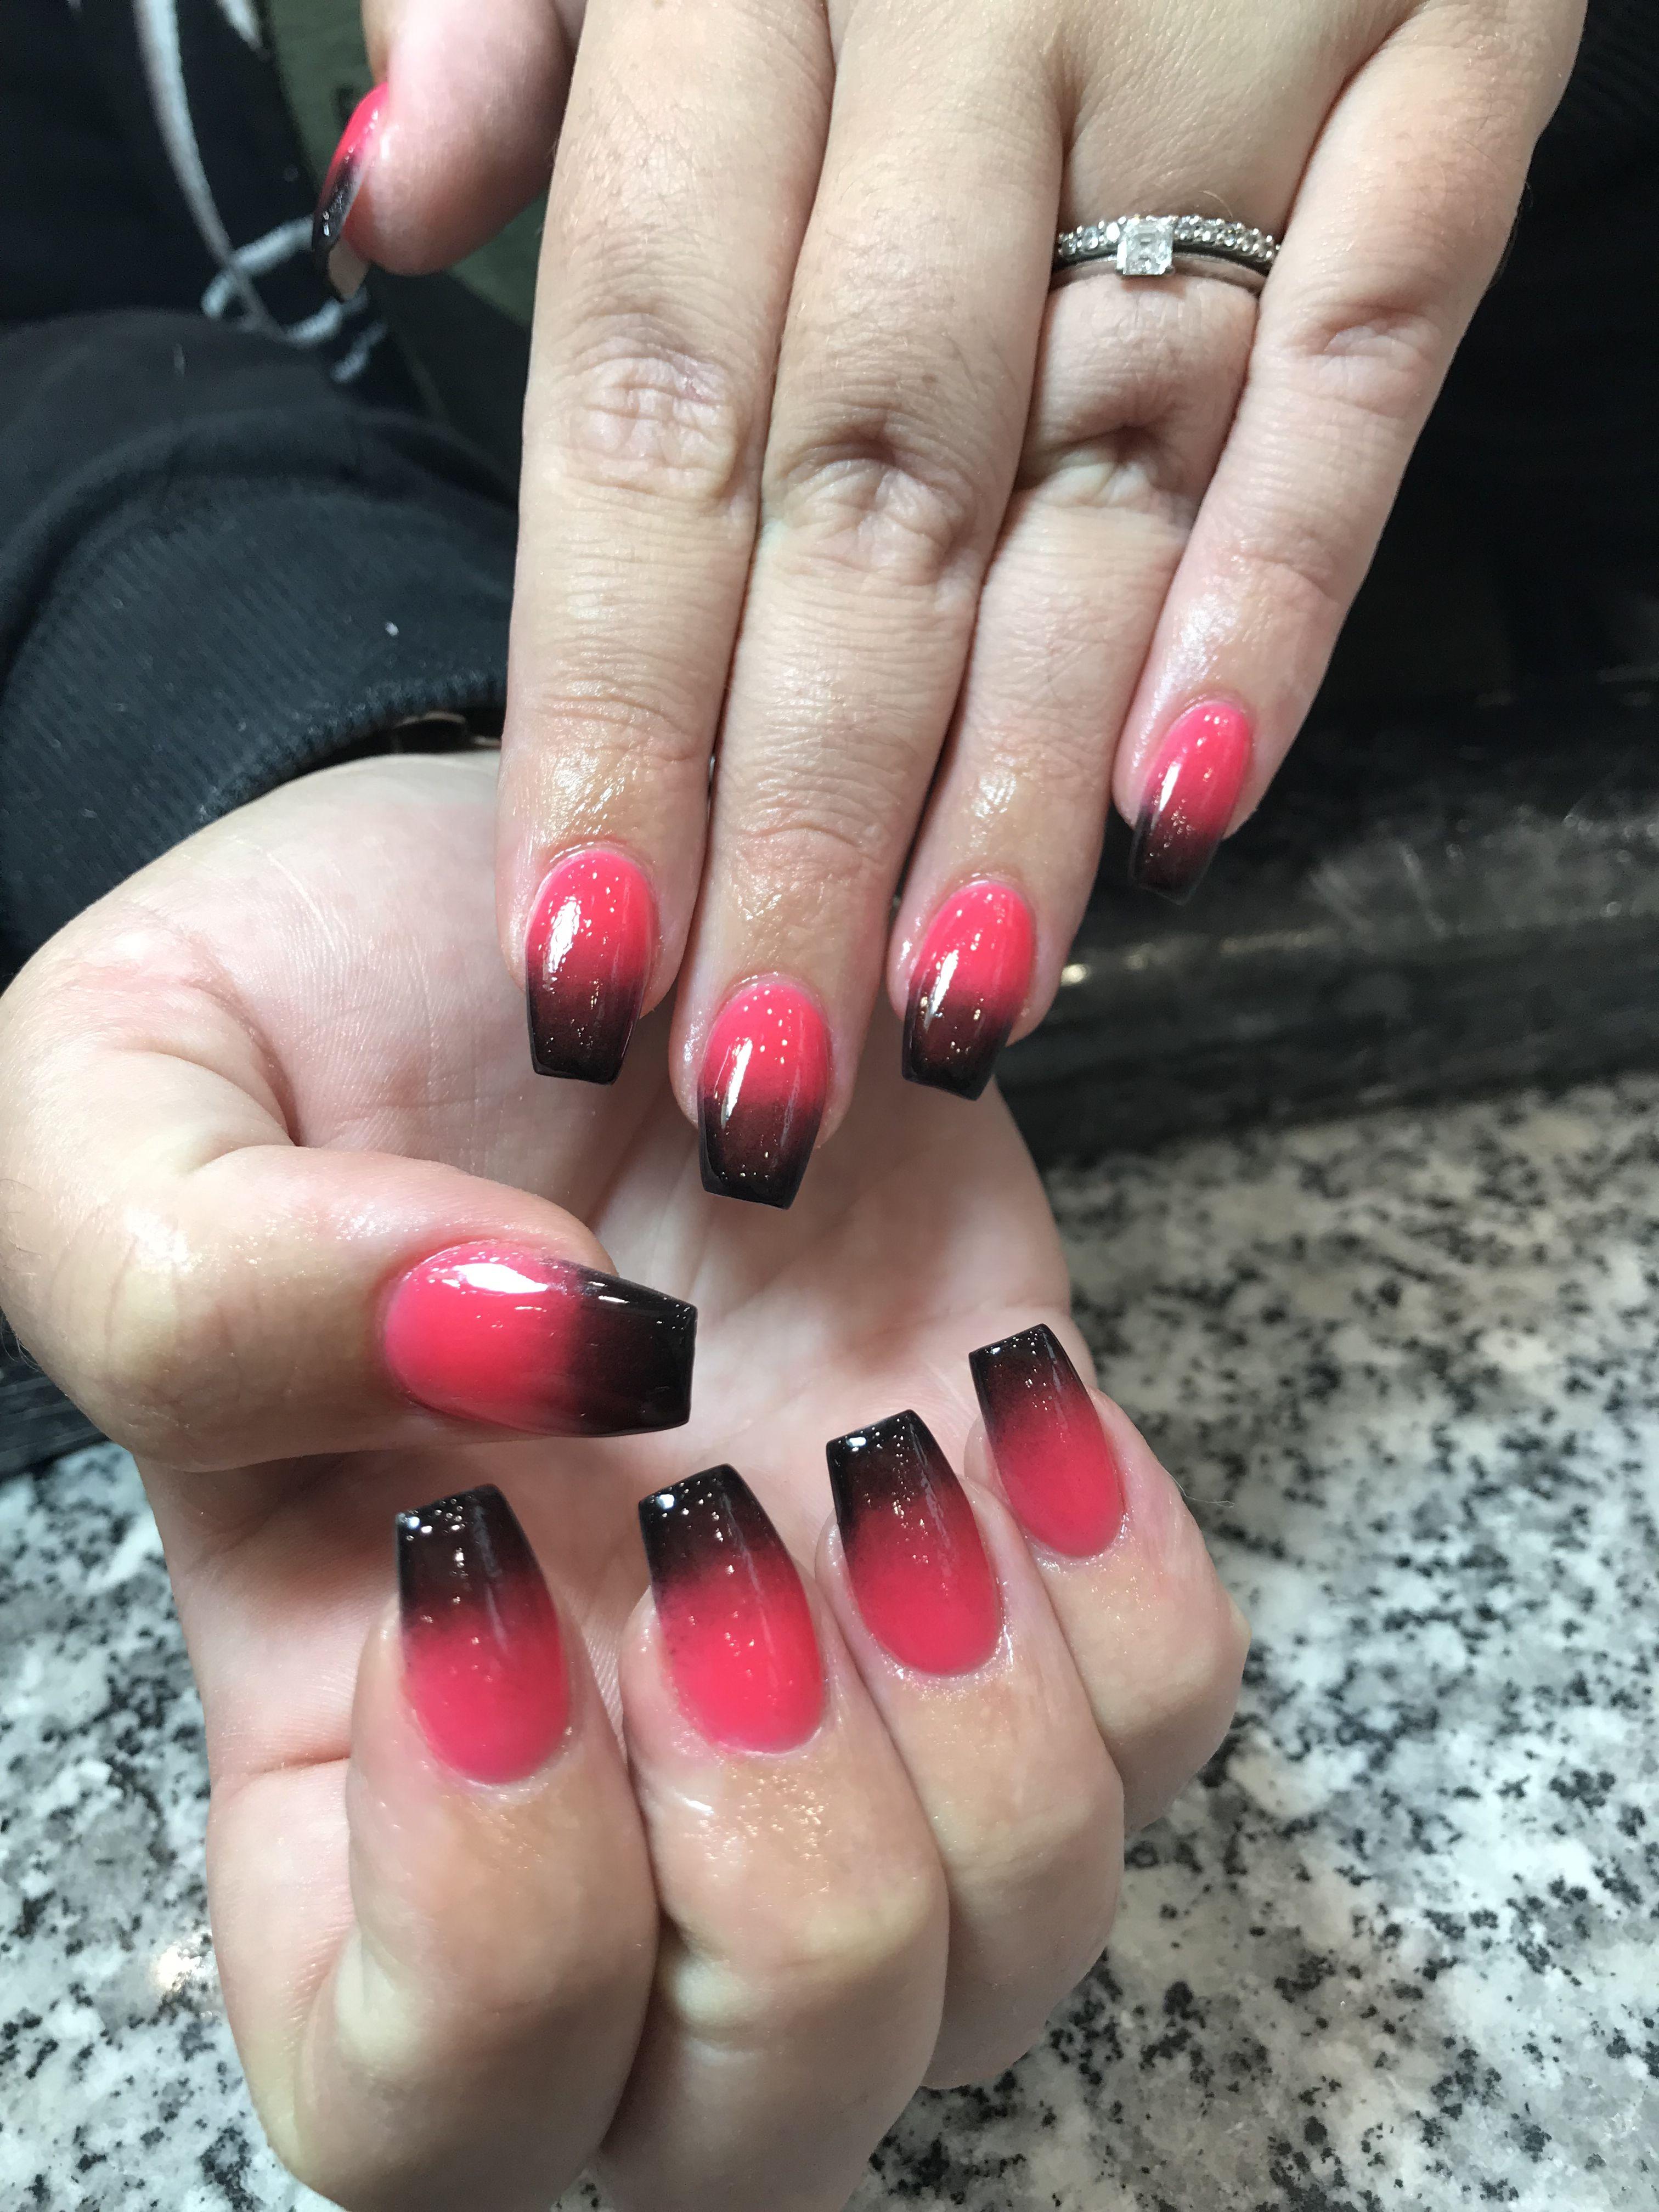 Ombre Sns Nails Black And Fluro Sns Nails Sns Nails Designs Nails